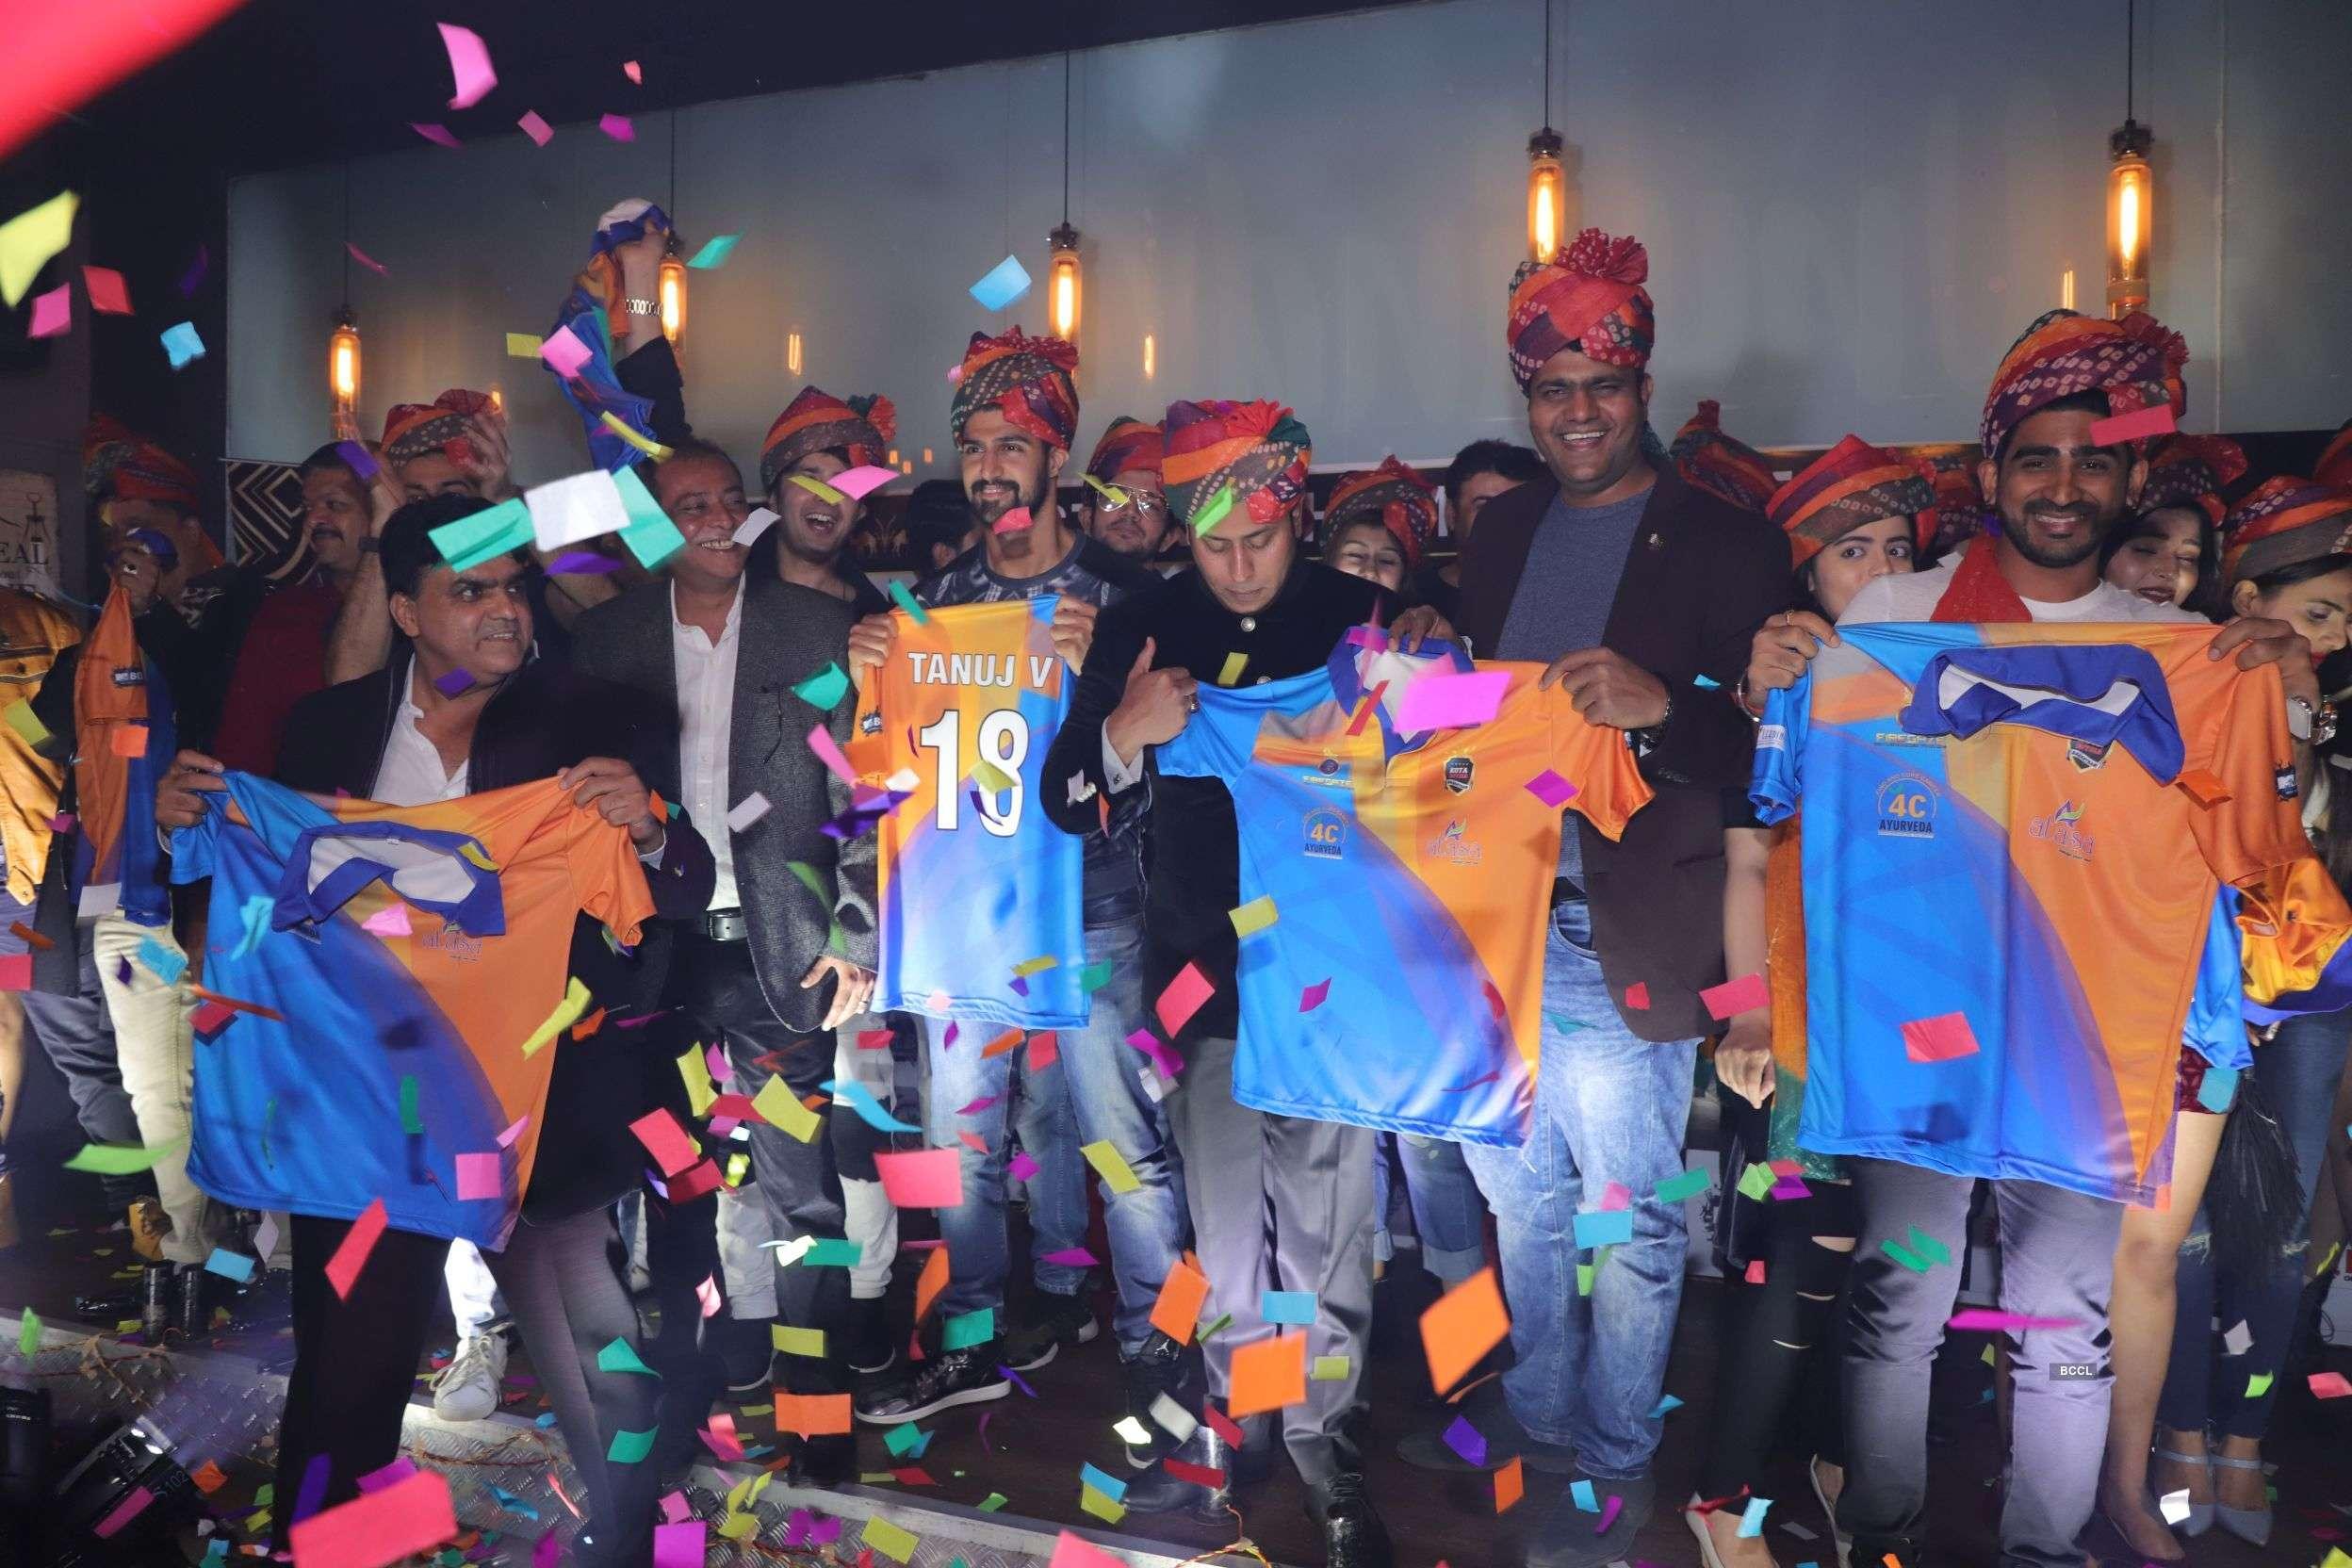 MTV BCL team Kota Royals Rajasthan's owners Riyaz Bhati, Sarosh Khan & Amin Pawar announce team members and it's official jersey